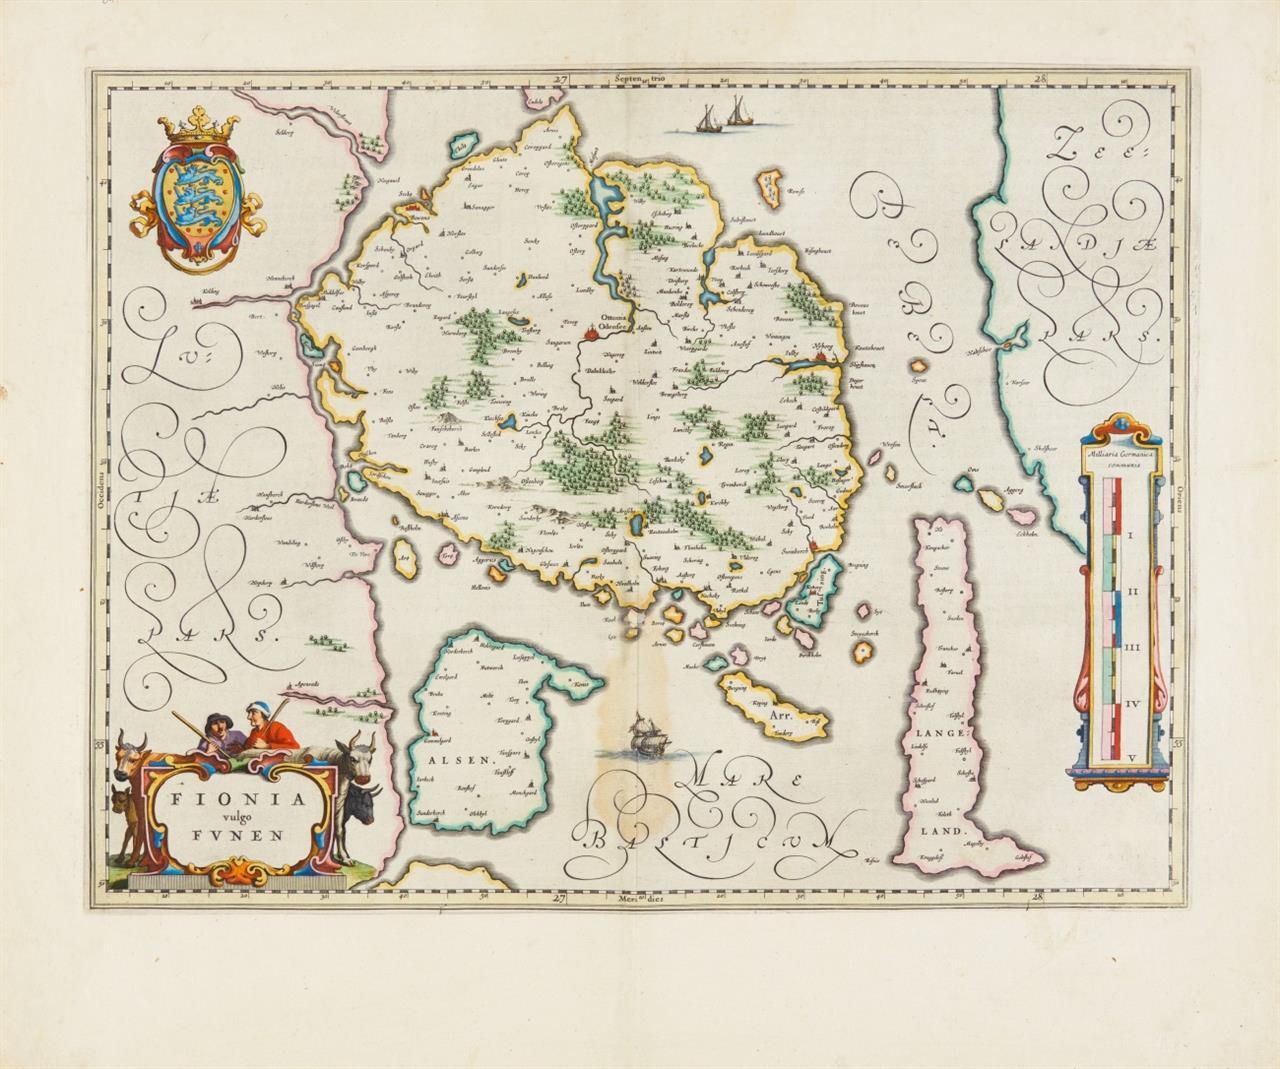 Fünen. Fiona vulgo Funen. 1644-55. Kolor. Kupferstichkarte bei J. Blaeu.